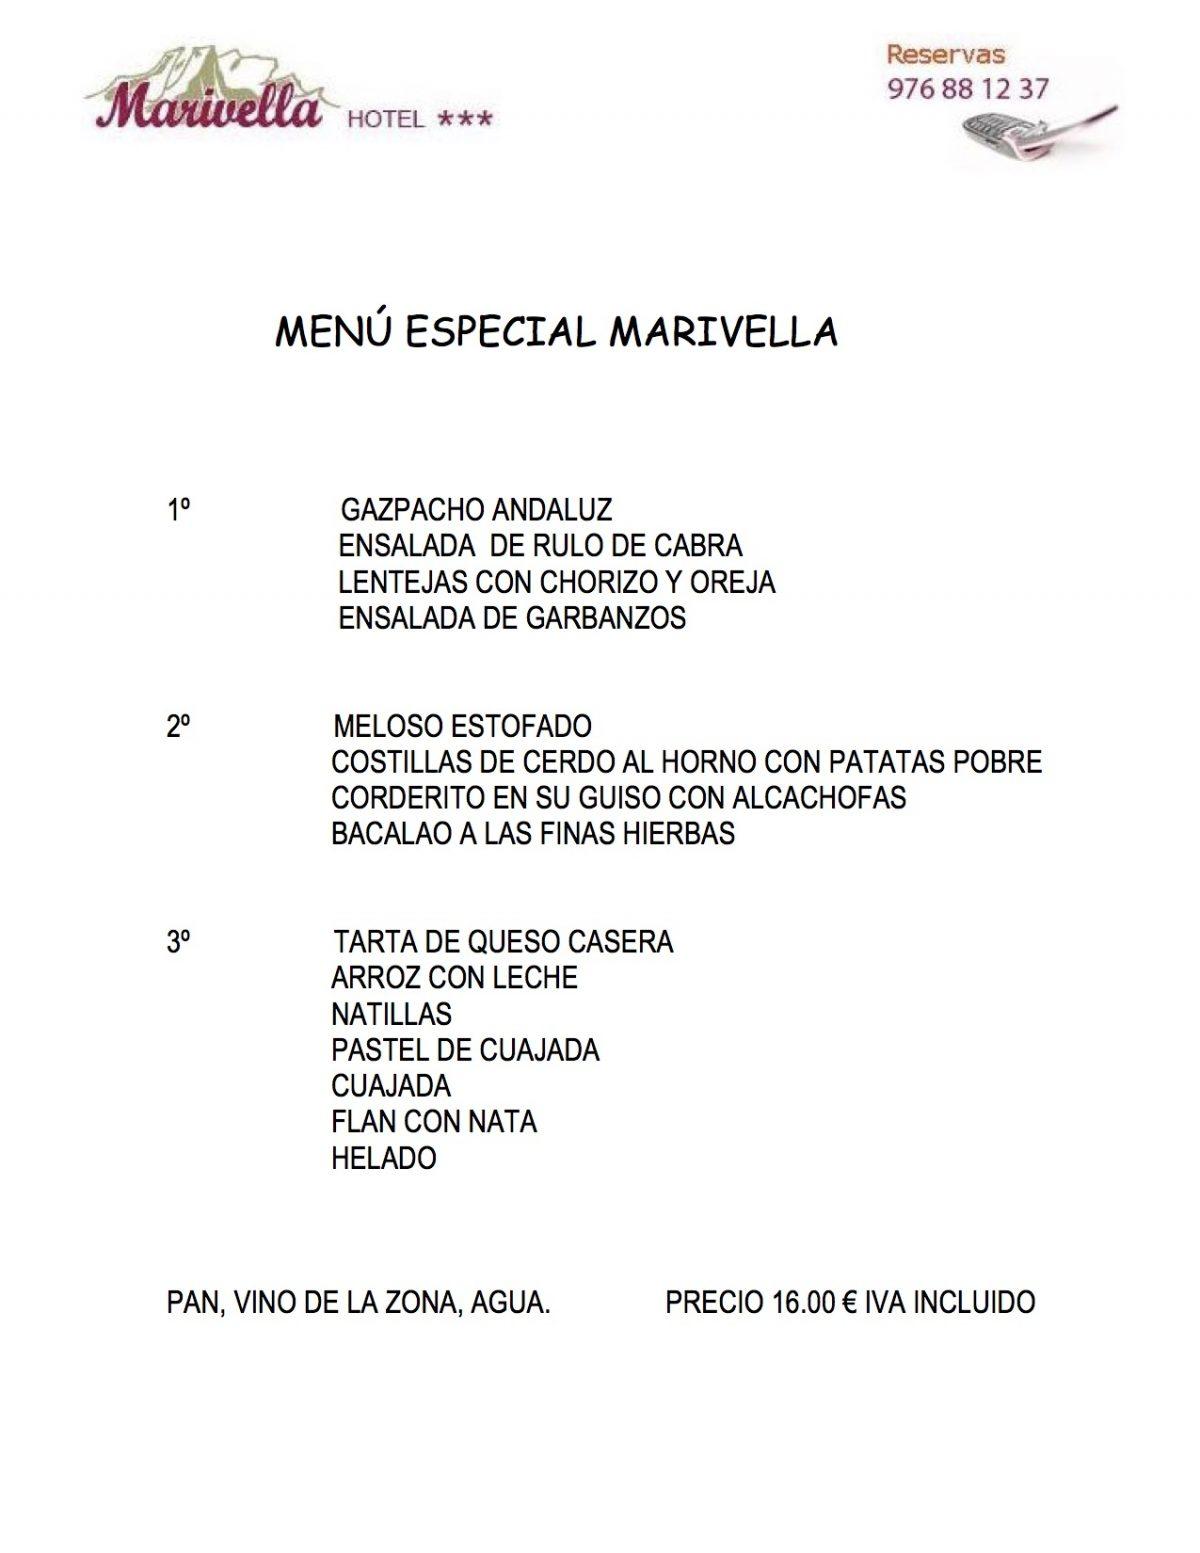 MENU-ESPECIAL-MARIVELLA-ENSALADA-DE-GARBAN-2-120817-1200x1553.jpg